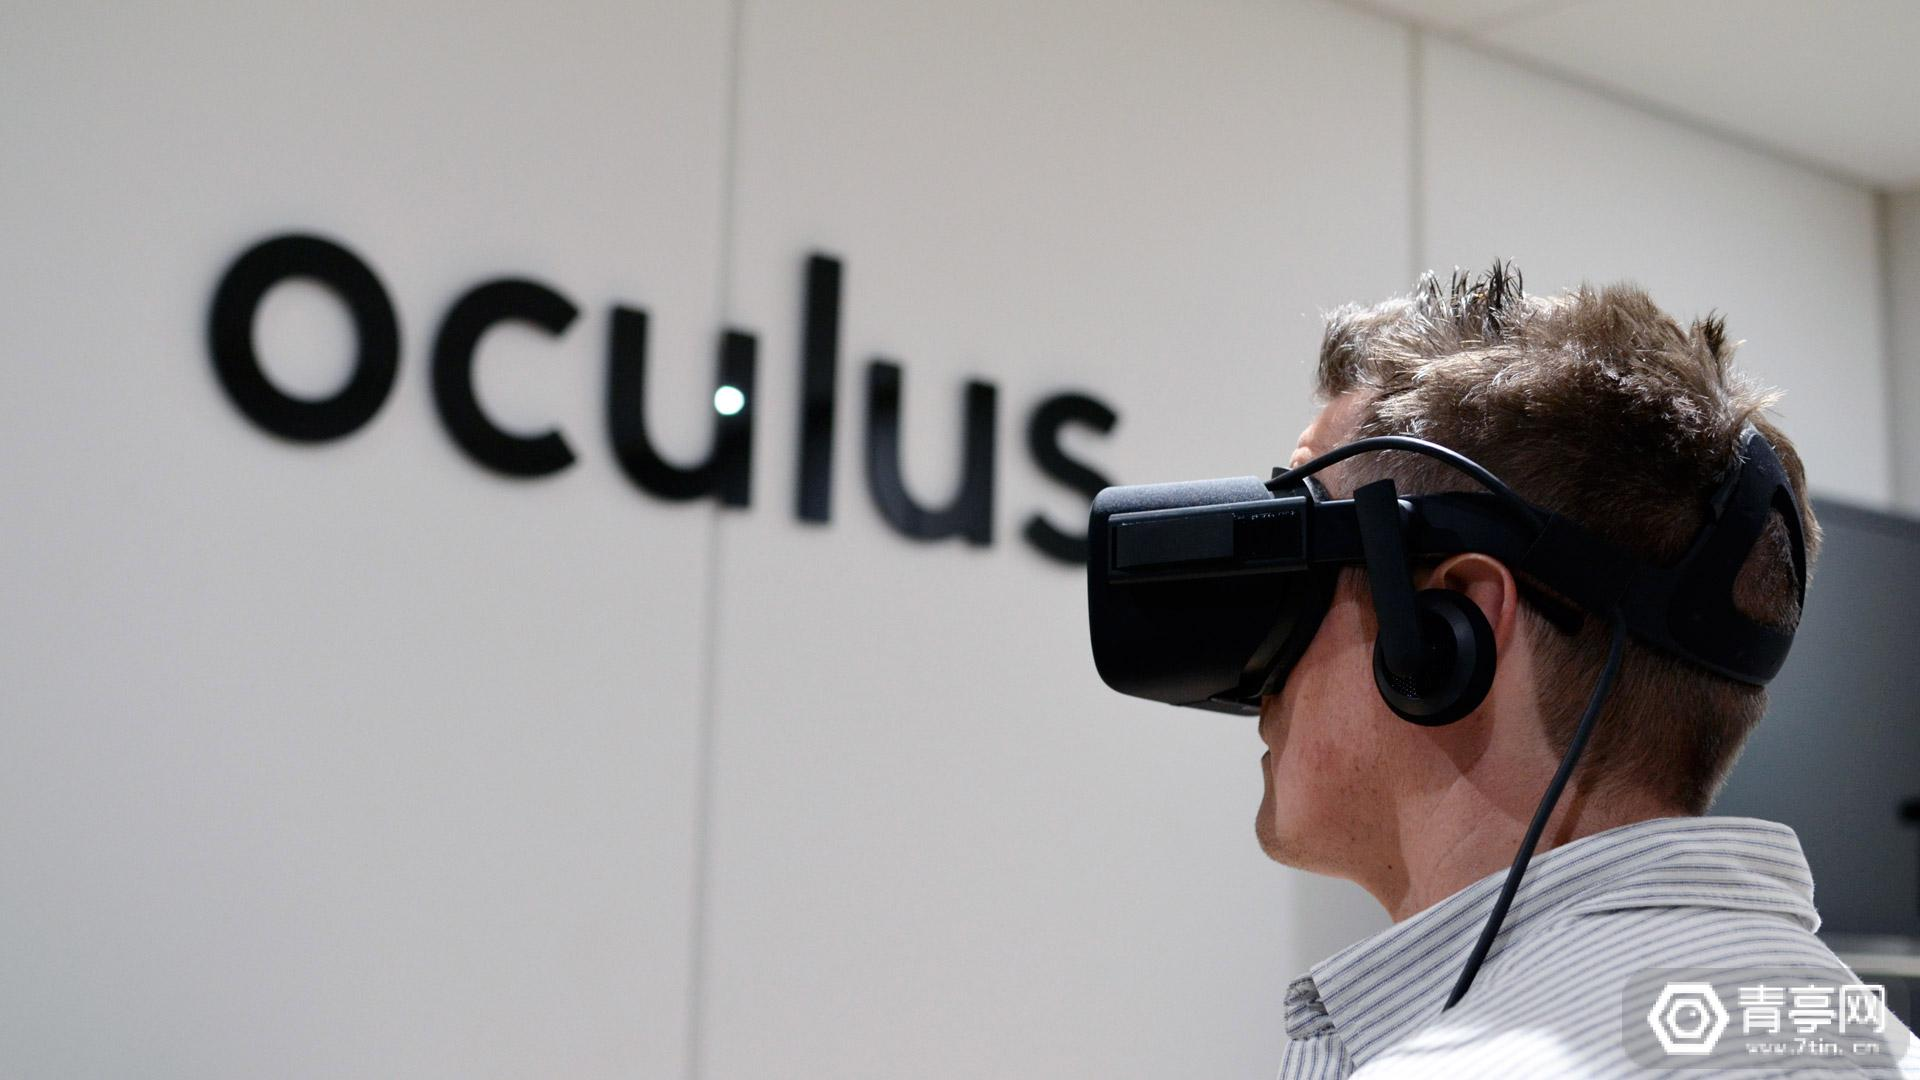 Oculus因侵犯版权赔偿ZeniMax2亿5千万美金